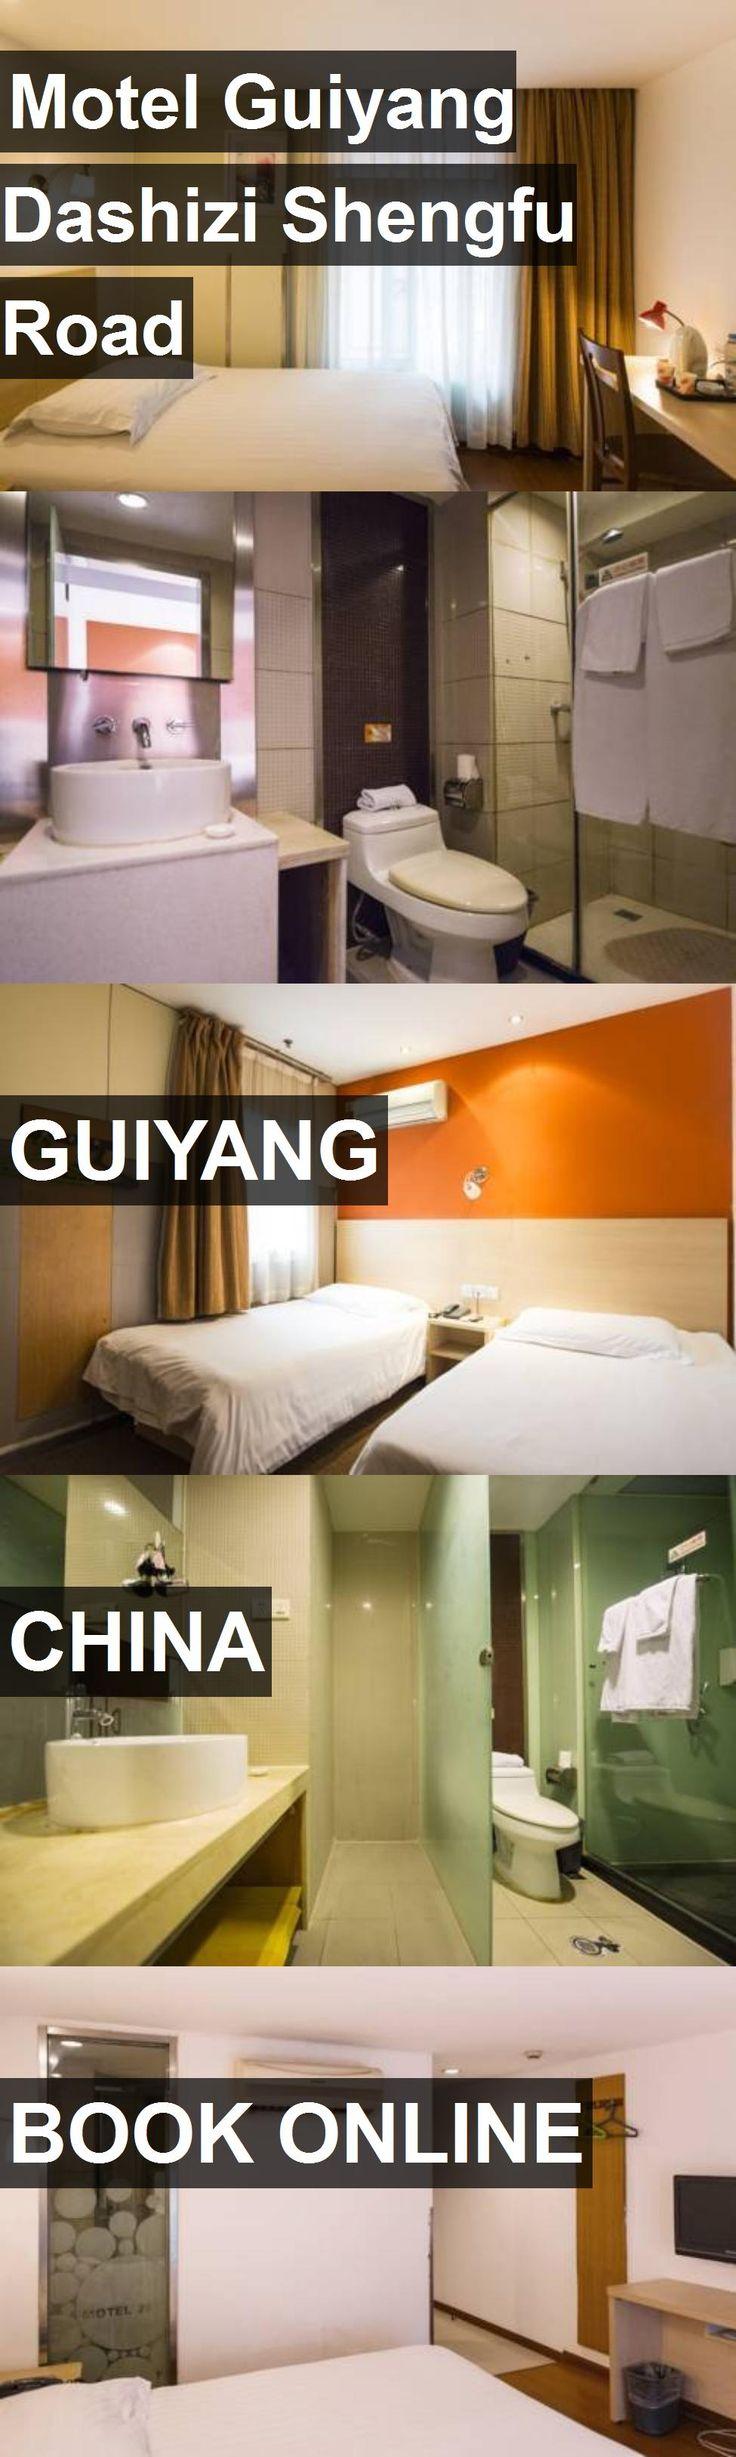 Hotel Motel Guiyang Dashizi Shengfu Road in Guiyang, China. For more information, photos, reviews and best prices please follow the link. #China #Guiyang #travel #vacation #hotel